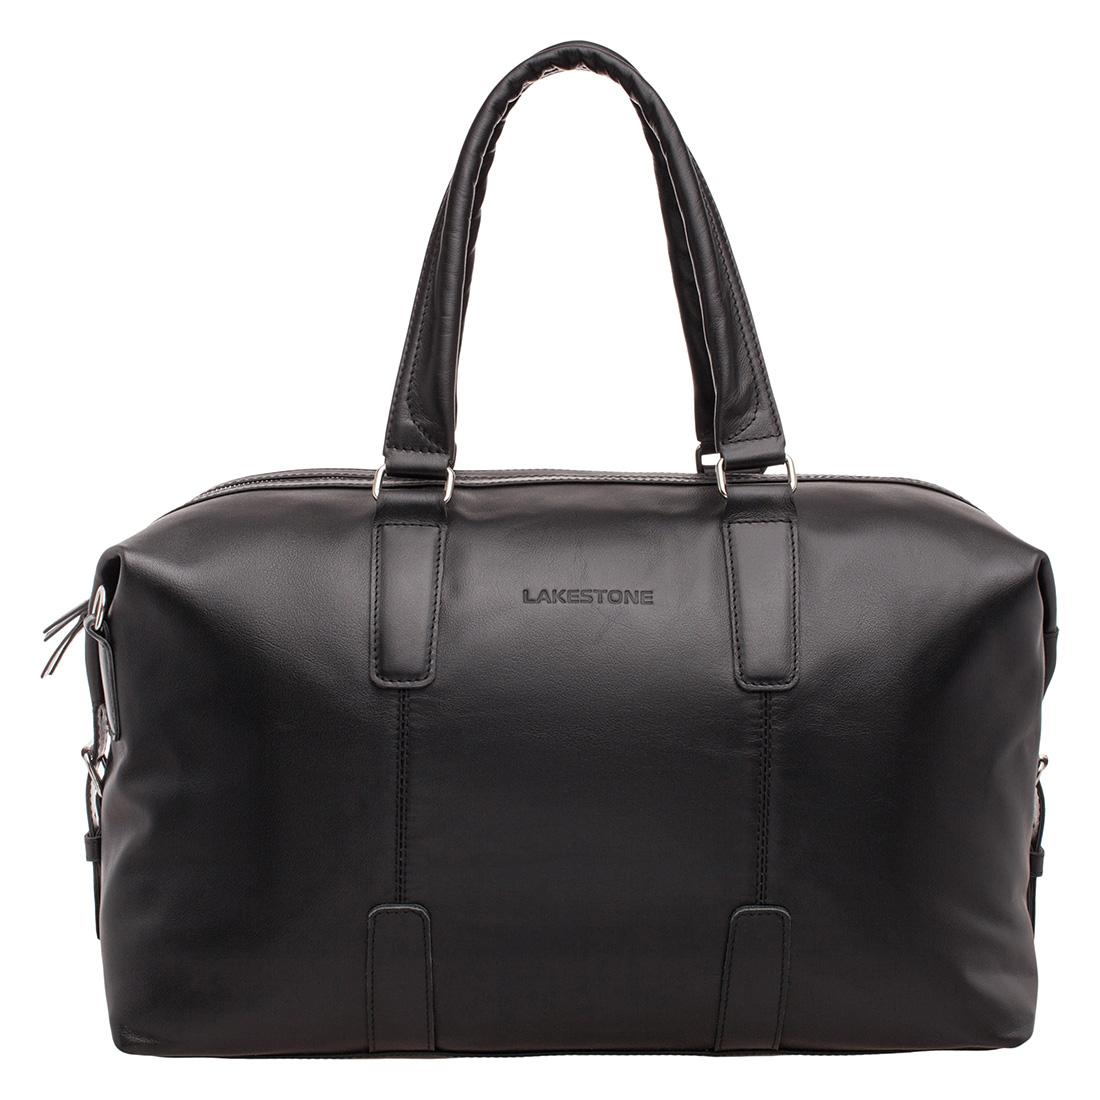 Дорожная сумка кожаная Lakestone 974320 черная 48 x 23 x 28 фото